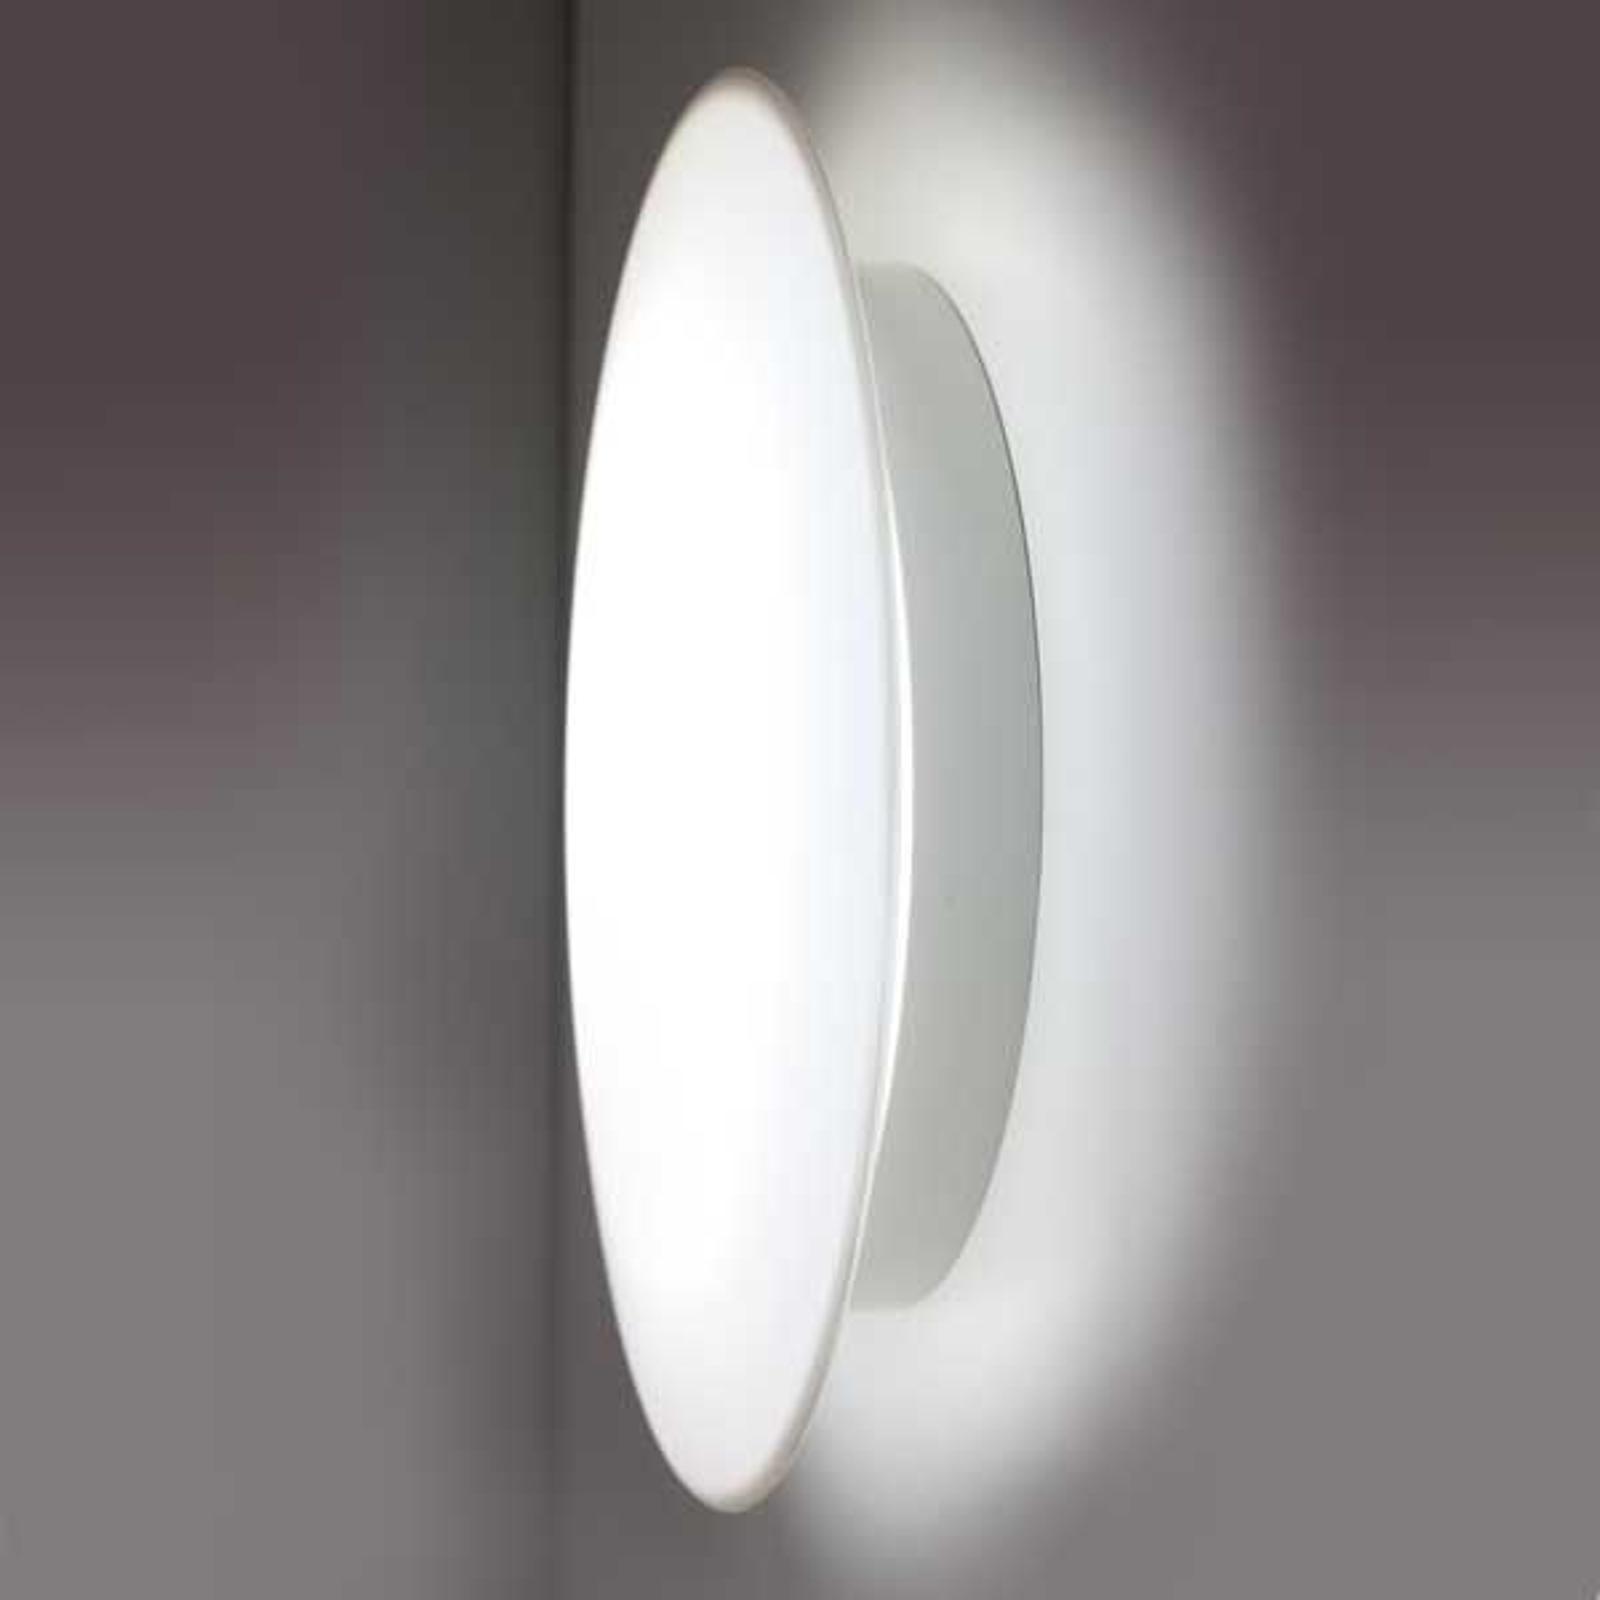 LED-Wandleuchte Sun 3 aus Kunststoff 4.000K 13W